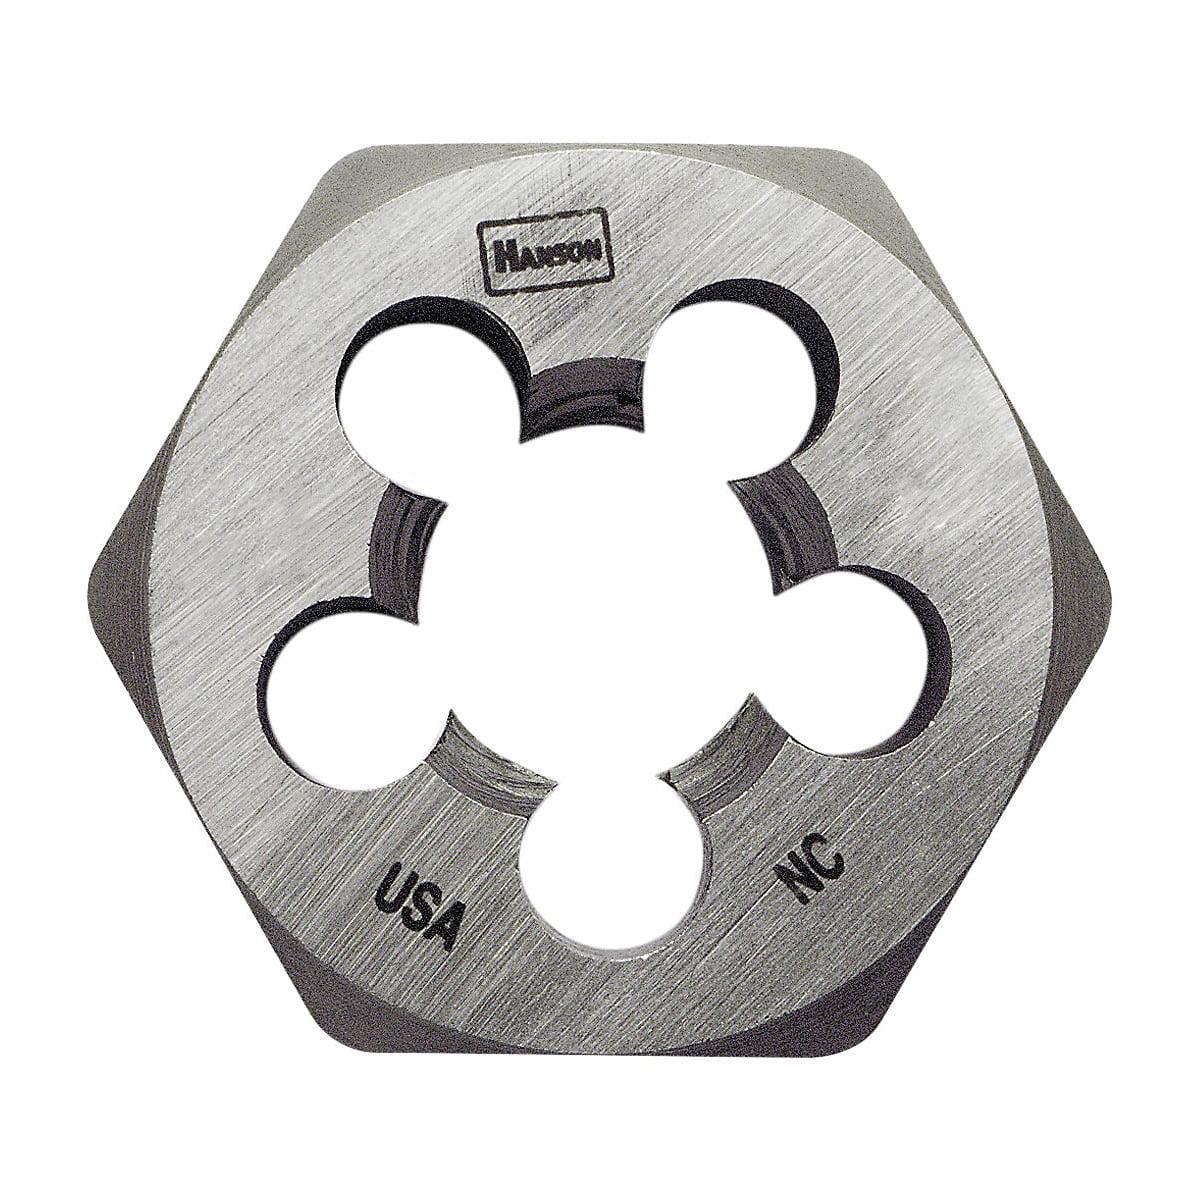 "IRWIN Hexagon Die 1/"" Across 1//8-27 NPT Industrial Tool Machine Screw Die 9502ZR"